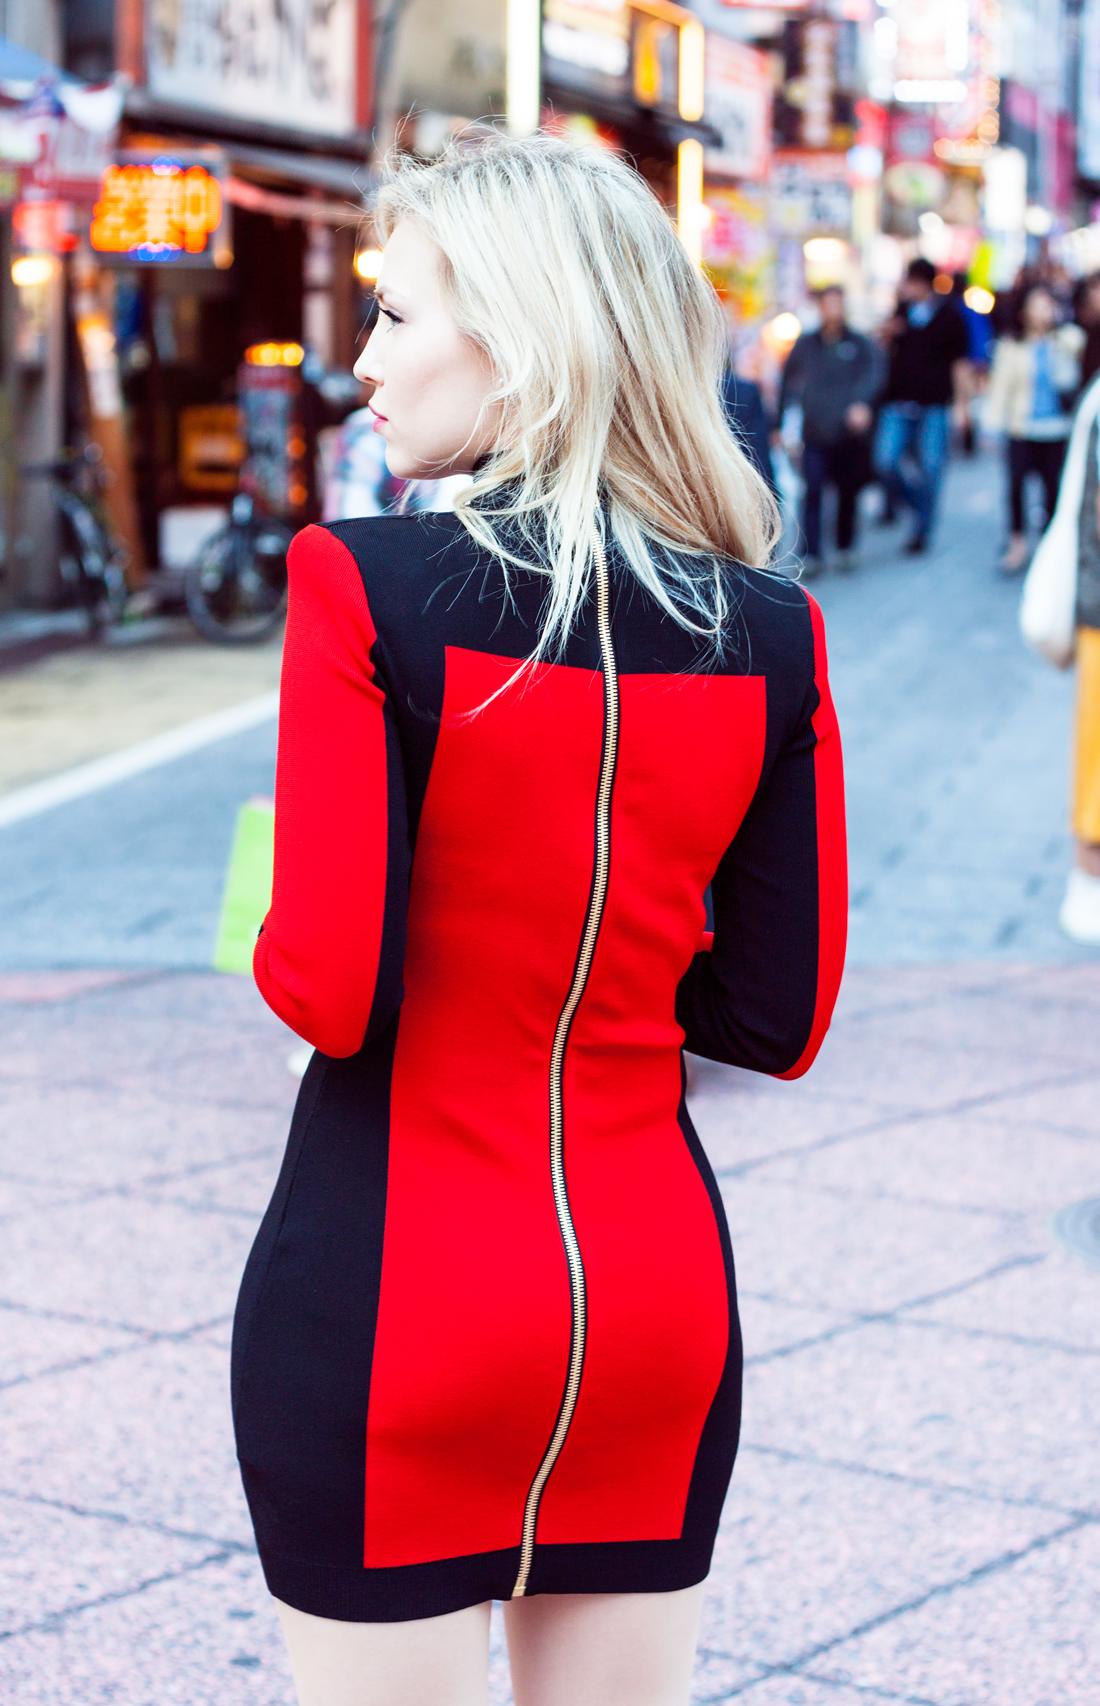 Balmain x H&M red dress, Balmain, Balmain japan, Balmain H&M, Tokyo, tokyo fashion, shinjuku, tokyo streetstyle, tokyo fashionblog